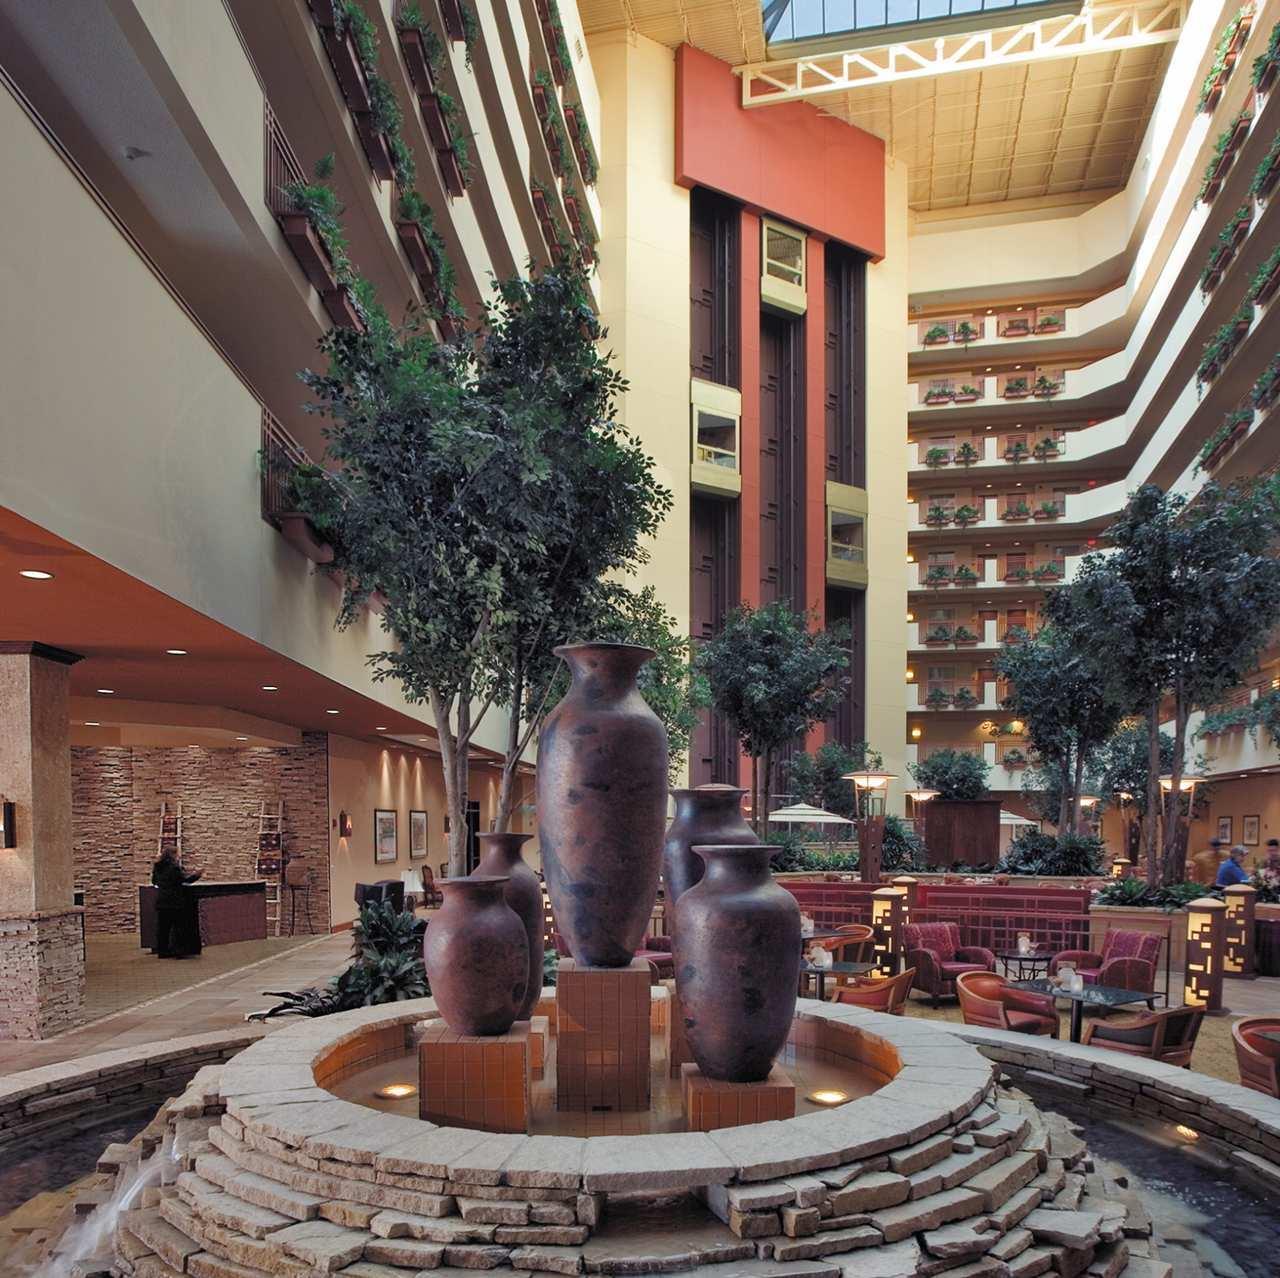 Embassy Suites by Hilton Albuquerque Hotel & Spa image 1